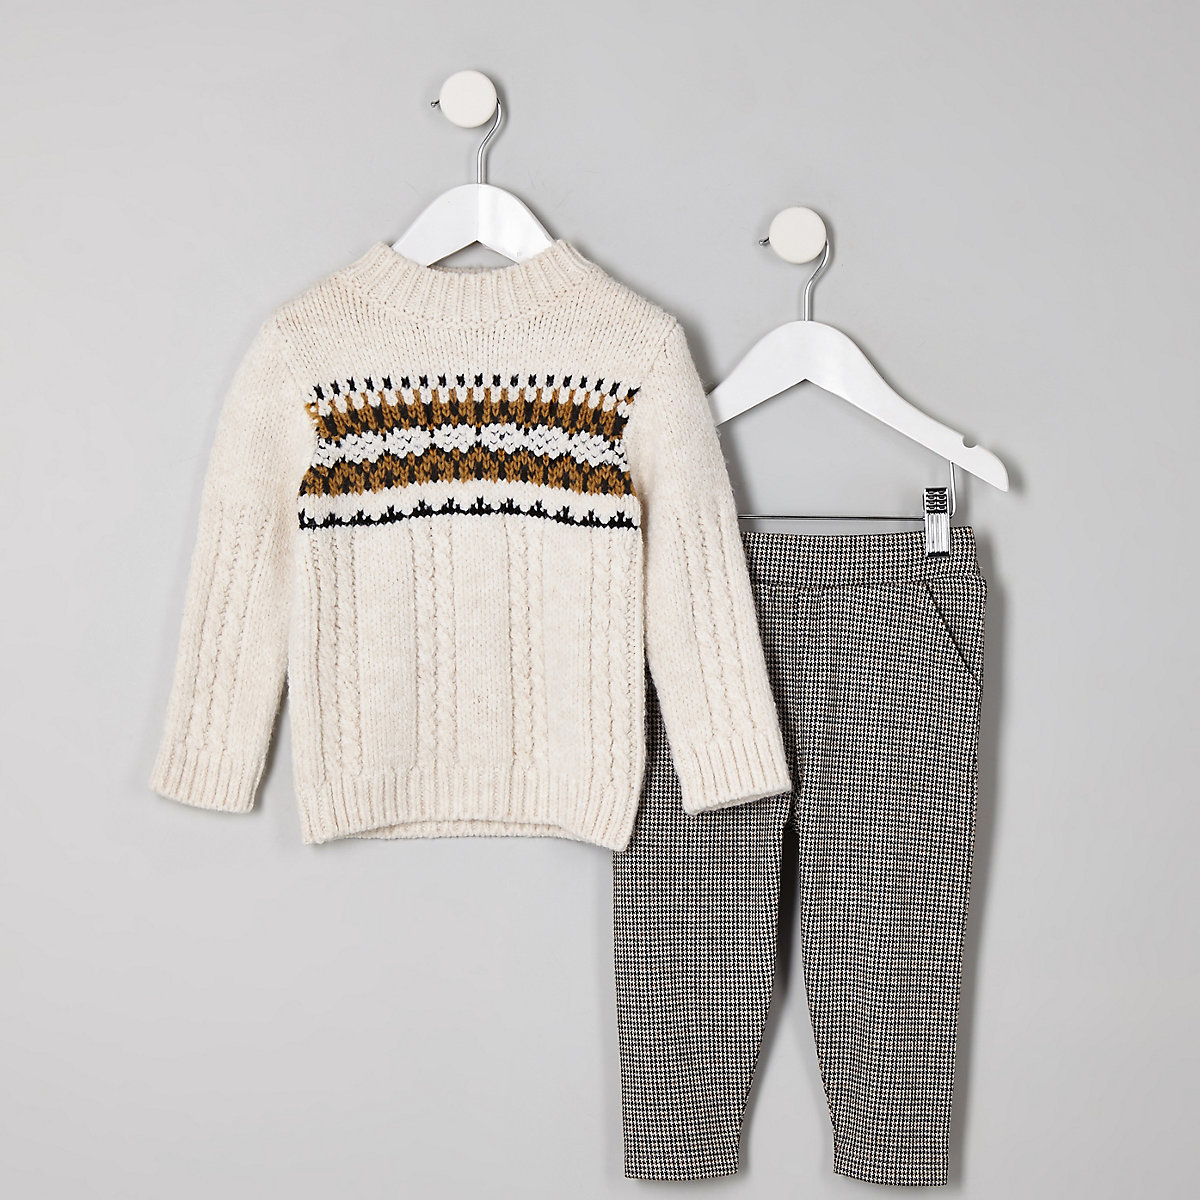 Mini boys ecru fairisle sweater outfit